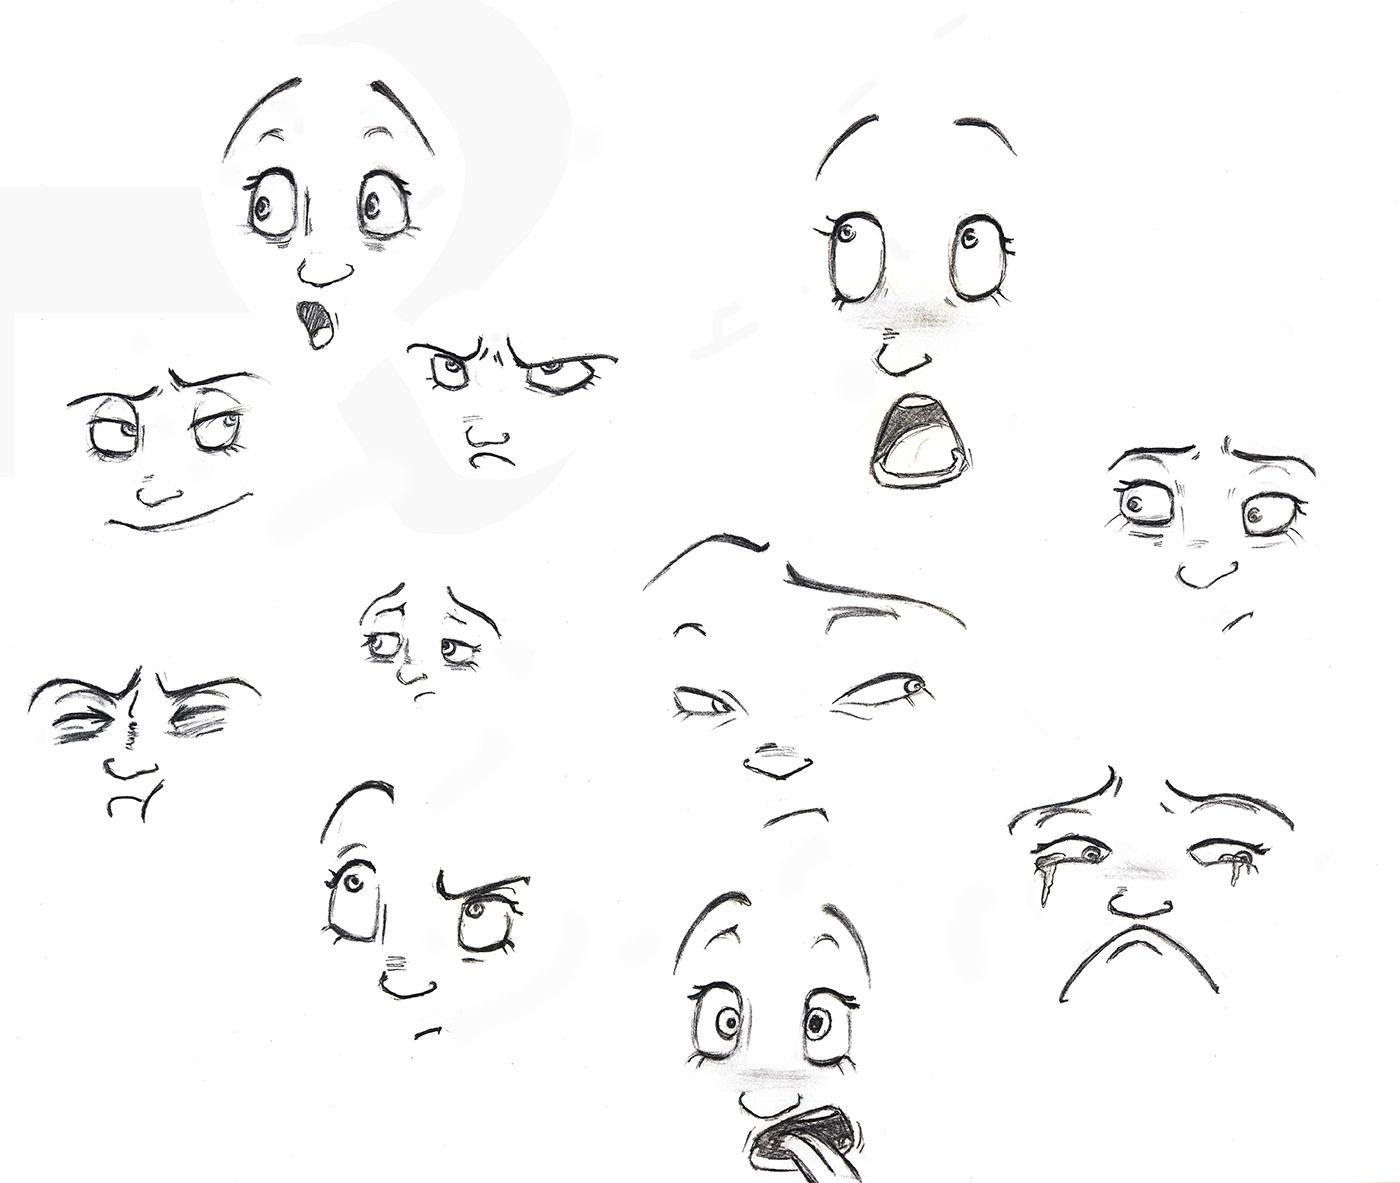 мимика лица рисунок форма плоскоклеточного рака